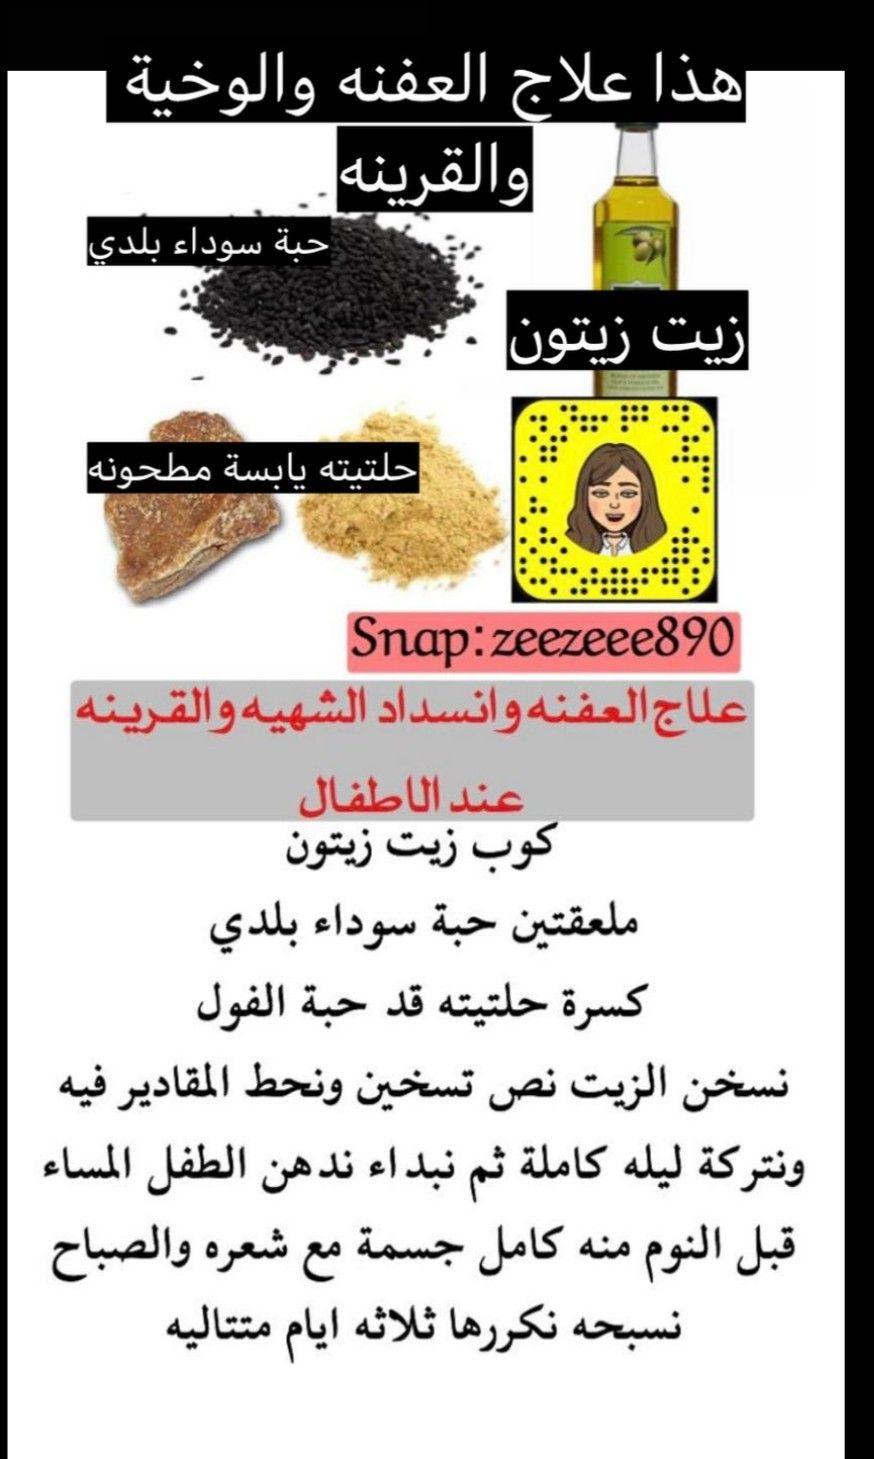 Pin By Zaaha 23 On العناية بالطفل